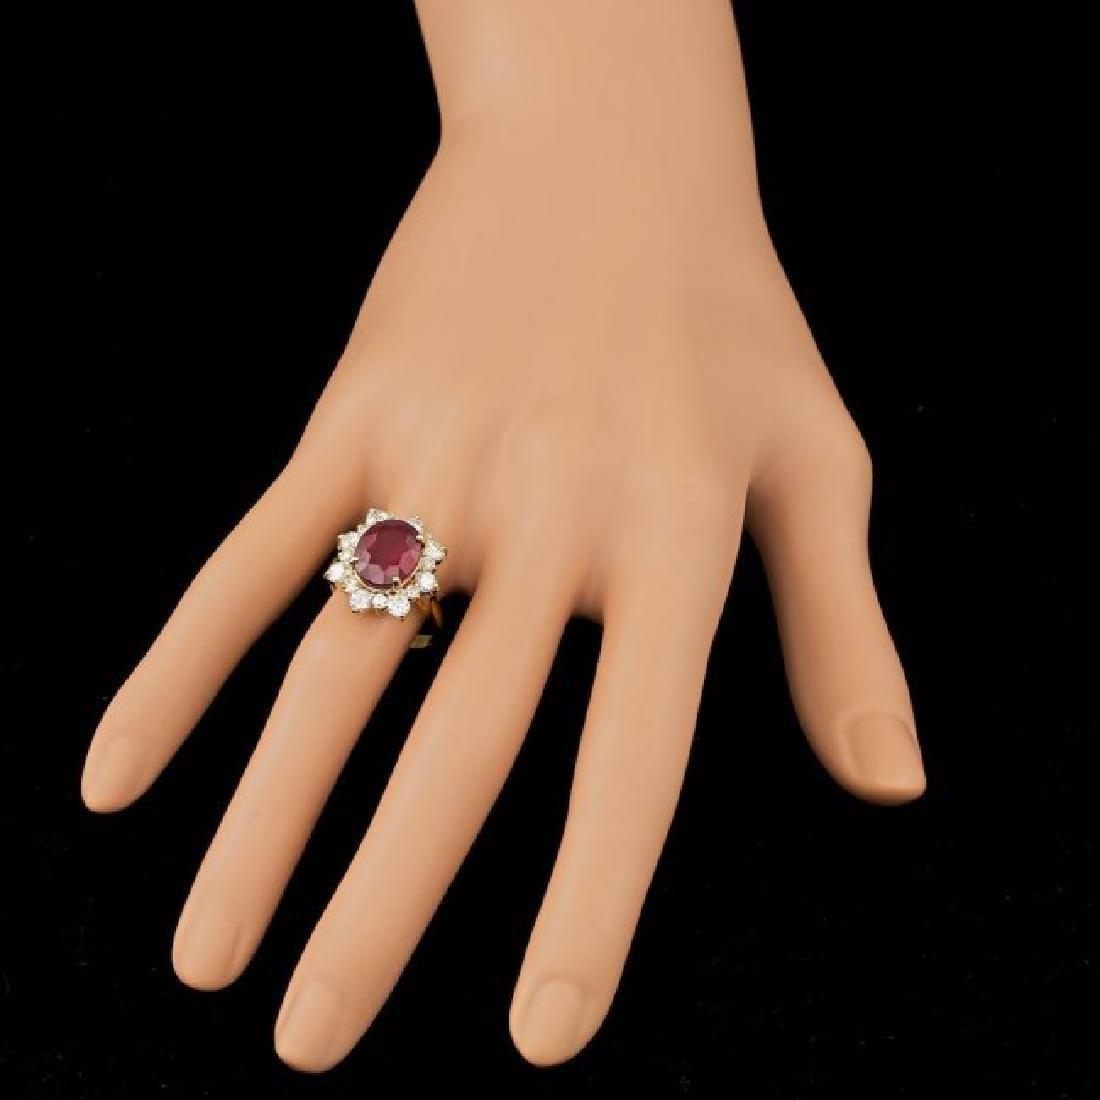 14k Yellow Gold 5.50ct Ruby 1.35ct Diamond Ring - 4